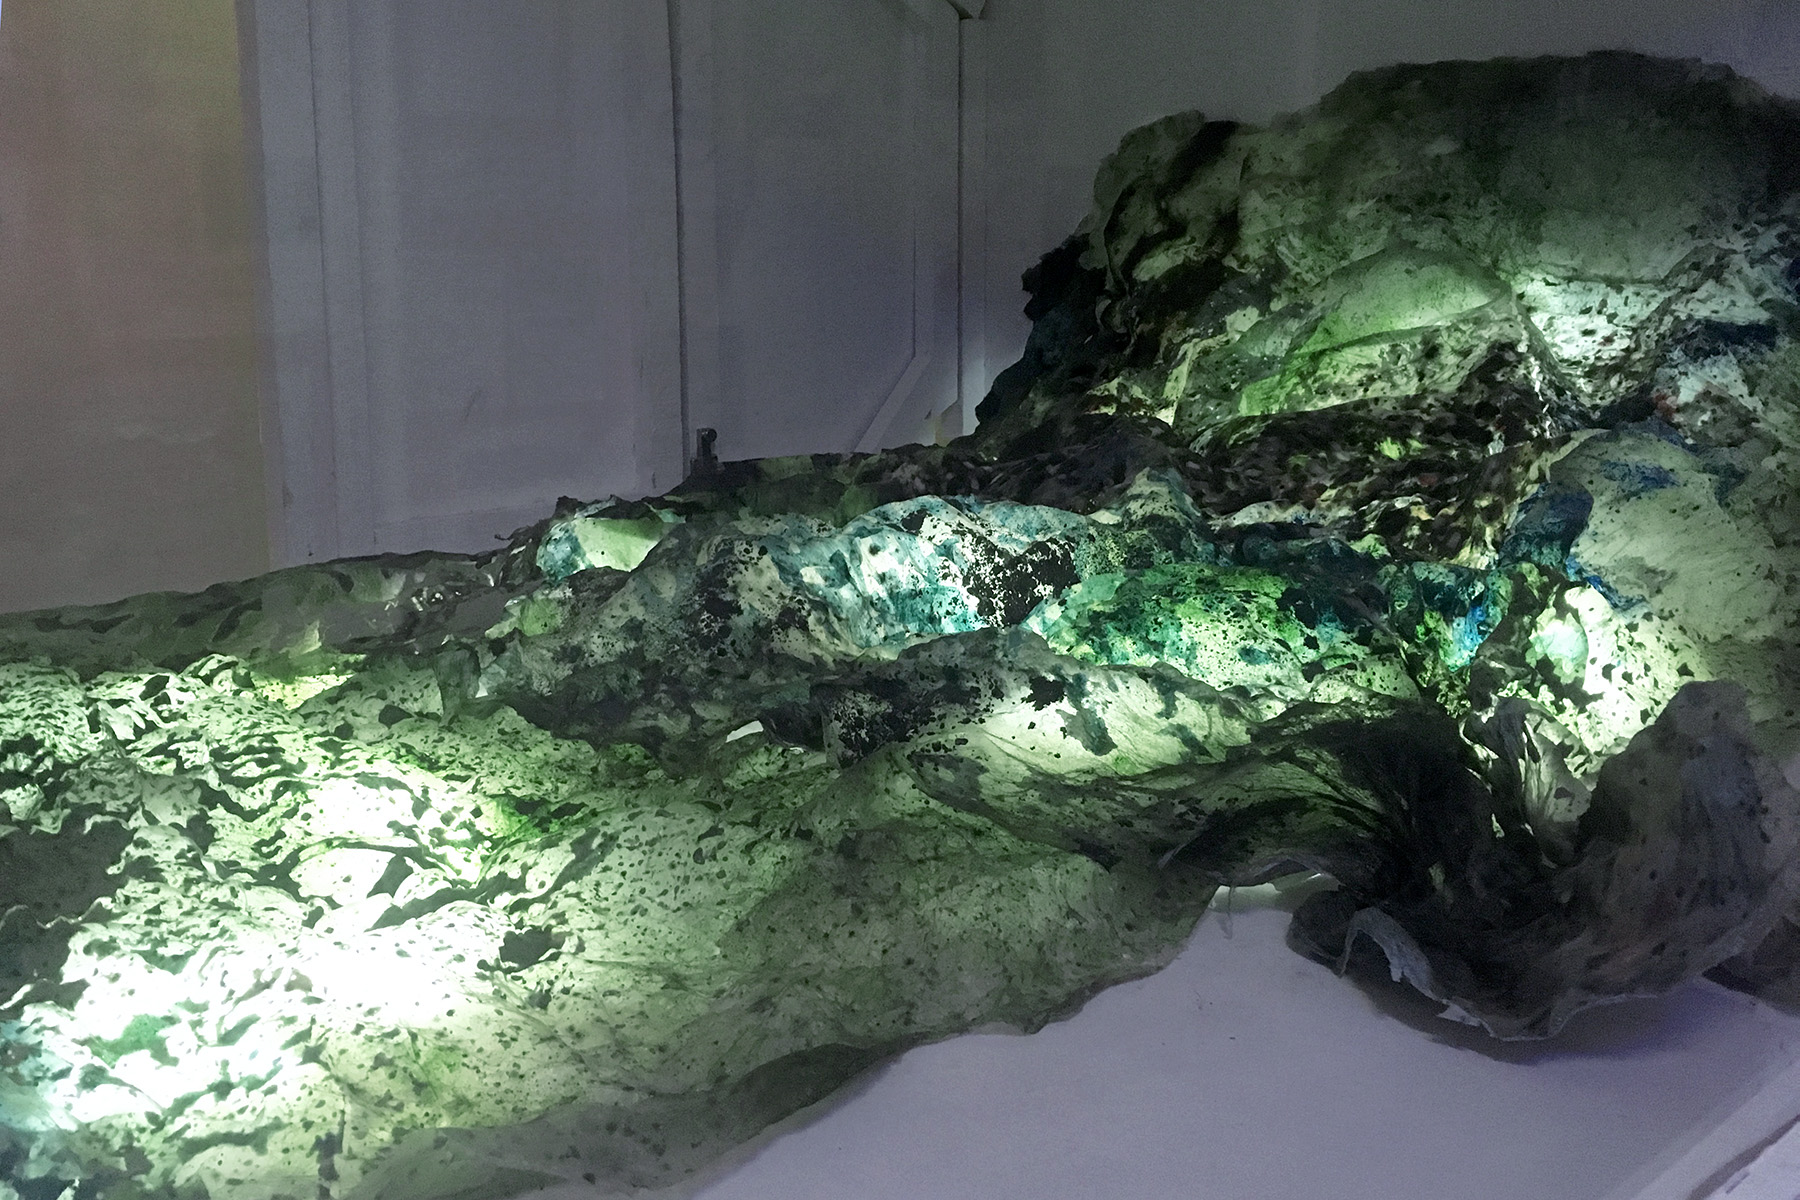 Charlotte GAUTIER VAN TOUR Relique Terre 2020, dimensions variables Agar-agar, spiruline, pigments naturels, néon flexible led © Charlotte Gautier Van Tour